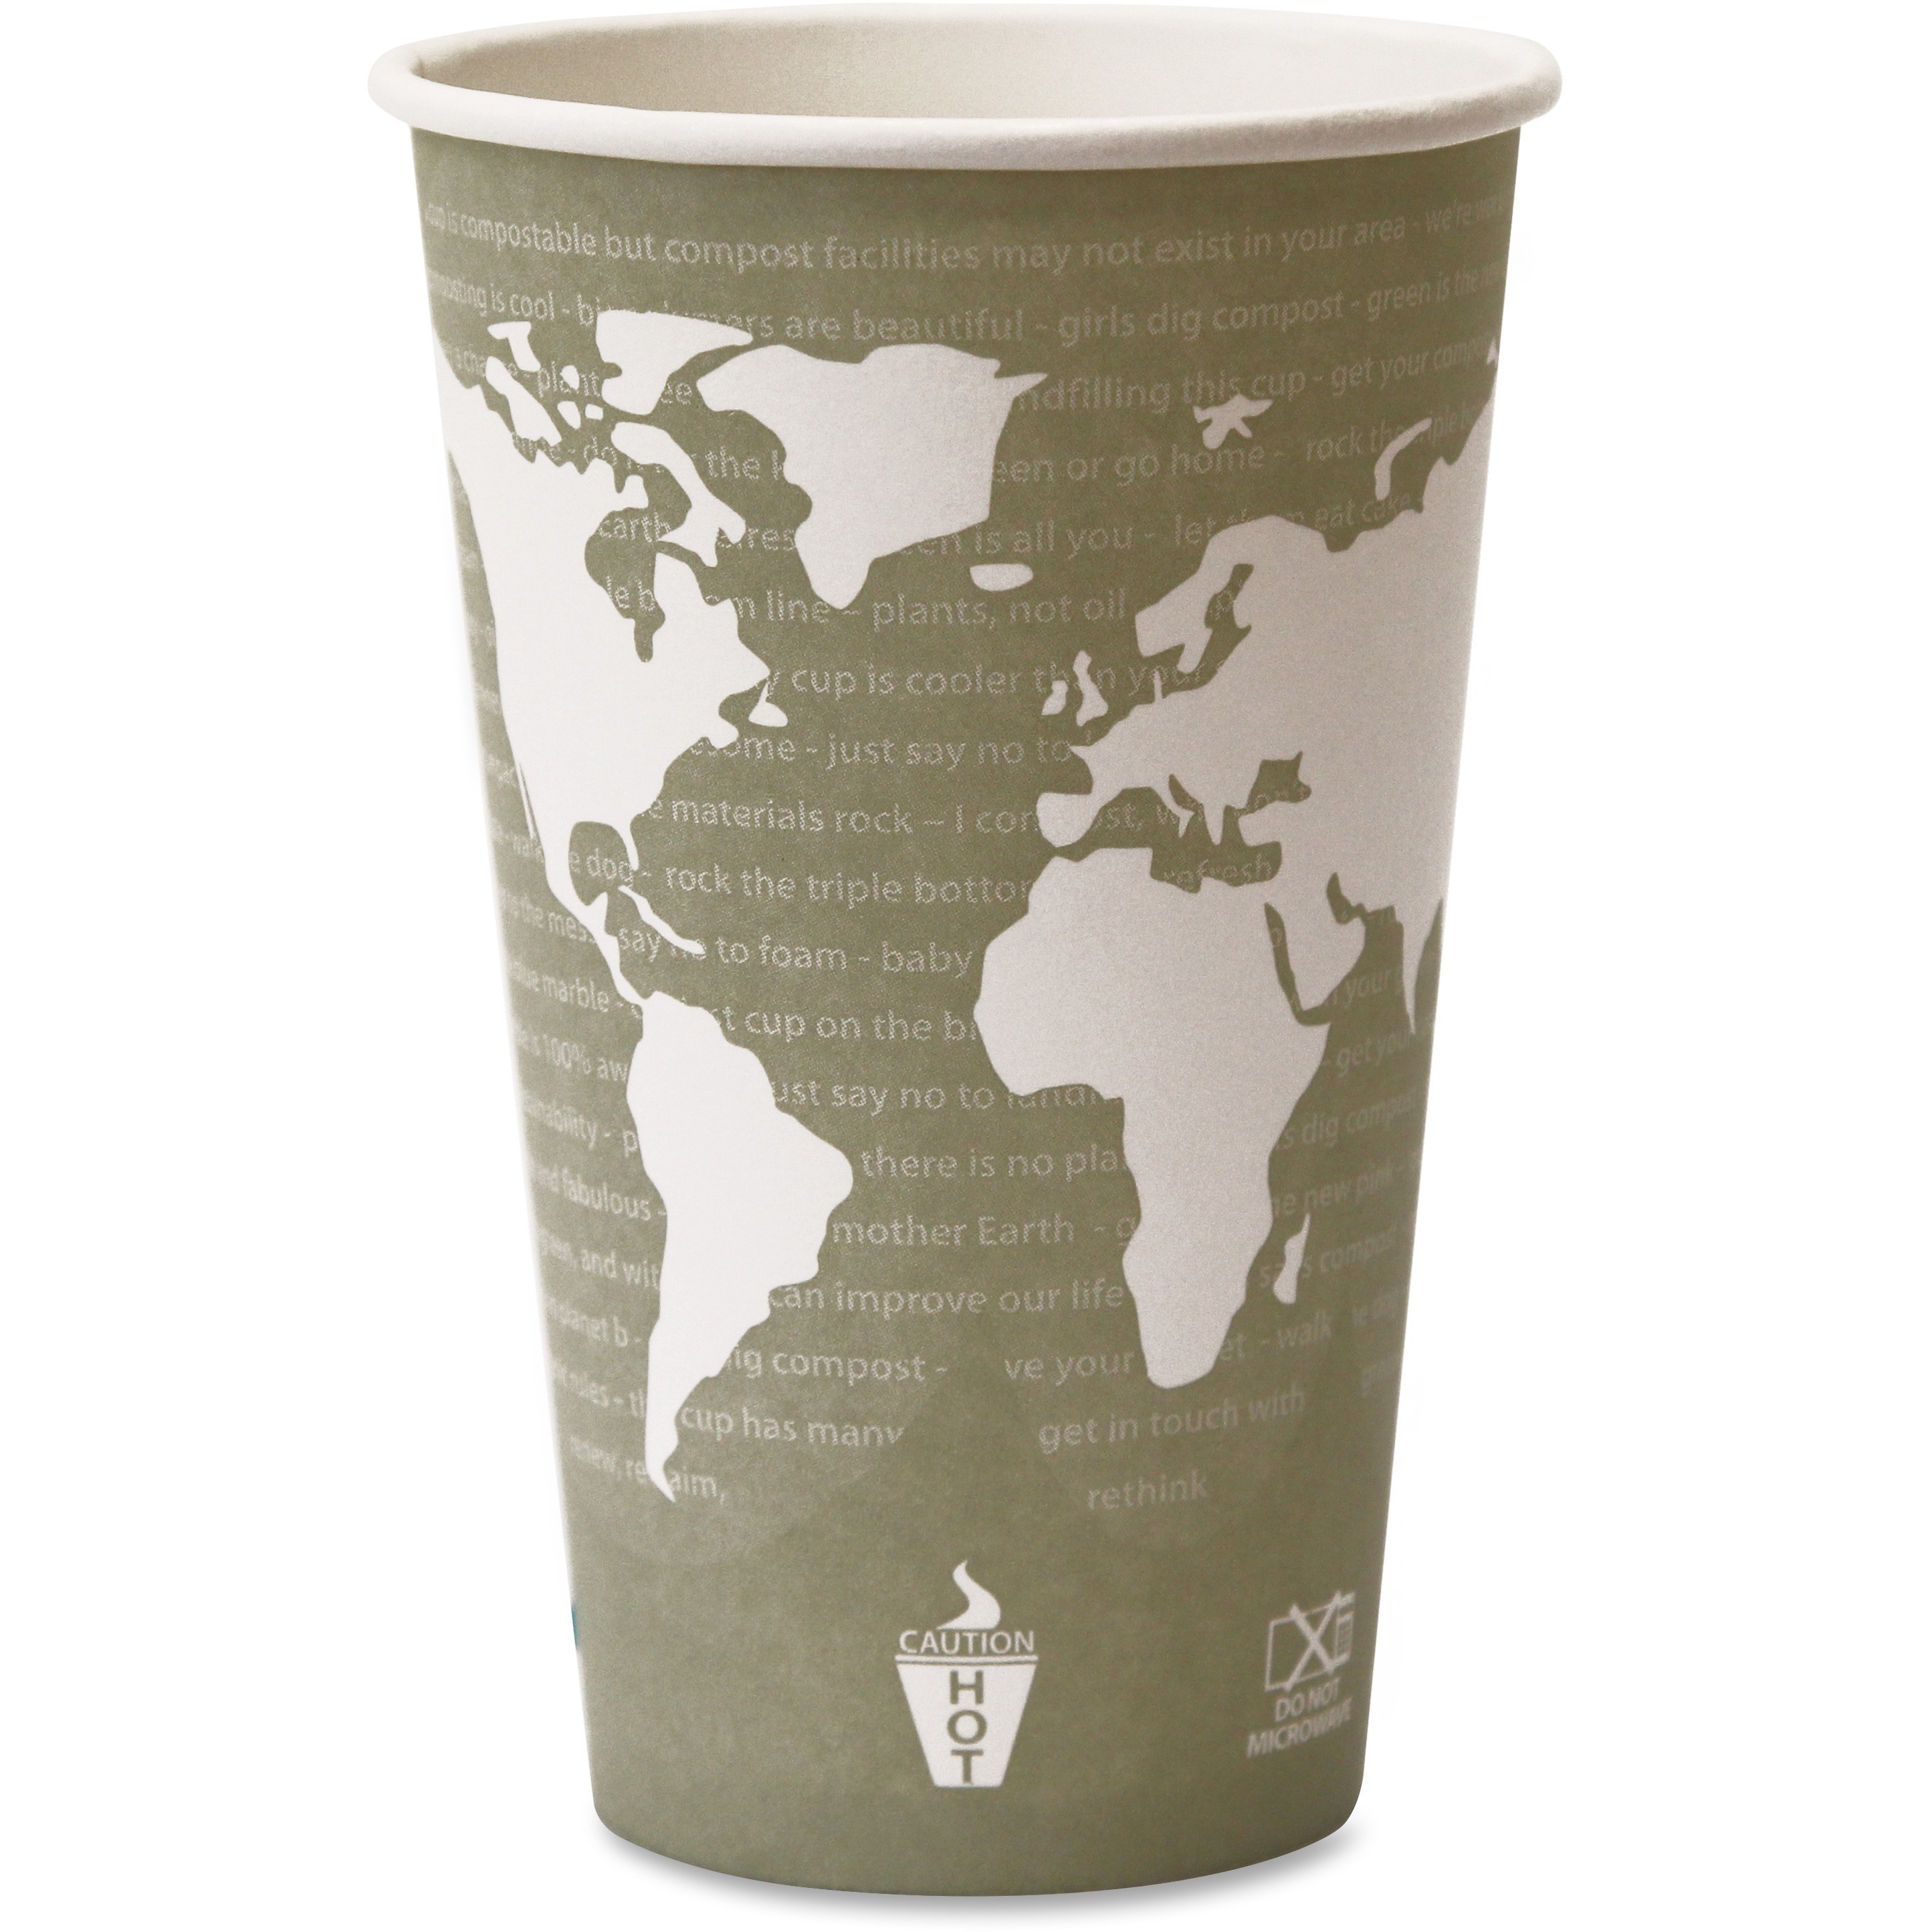 Eco-Products, ECOEPBHC16WA, World Art Hot Beverage Cups, 1000 / Carton, Multi, 16 fl oz